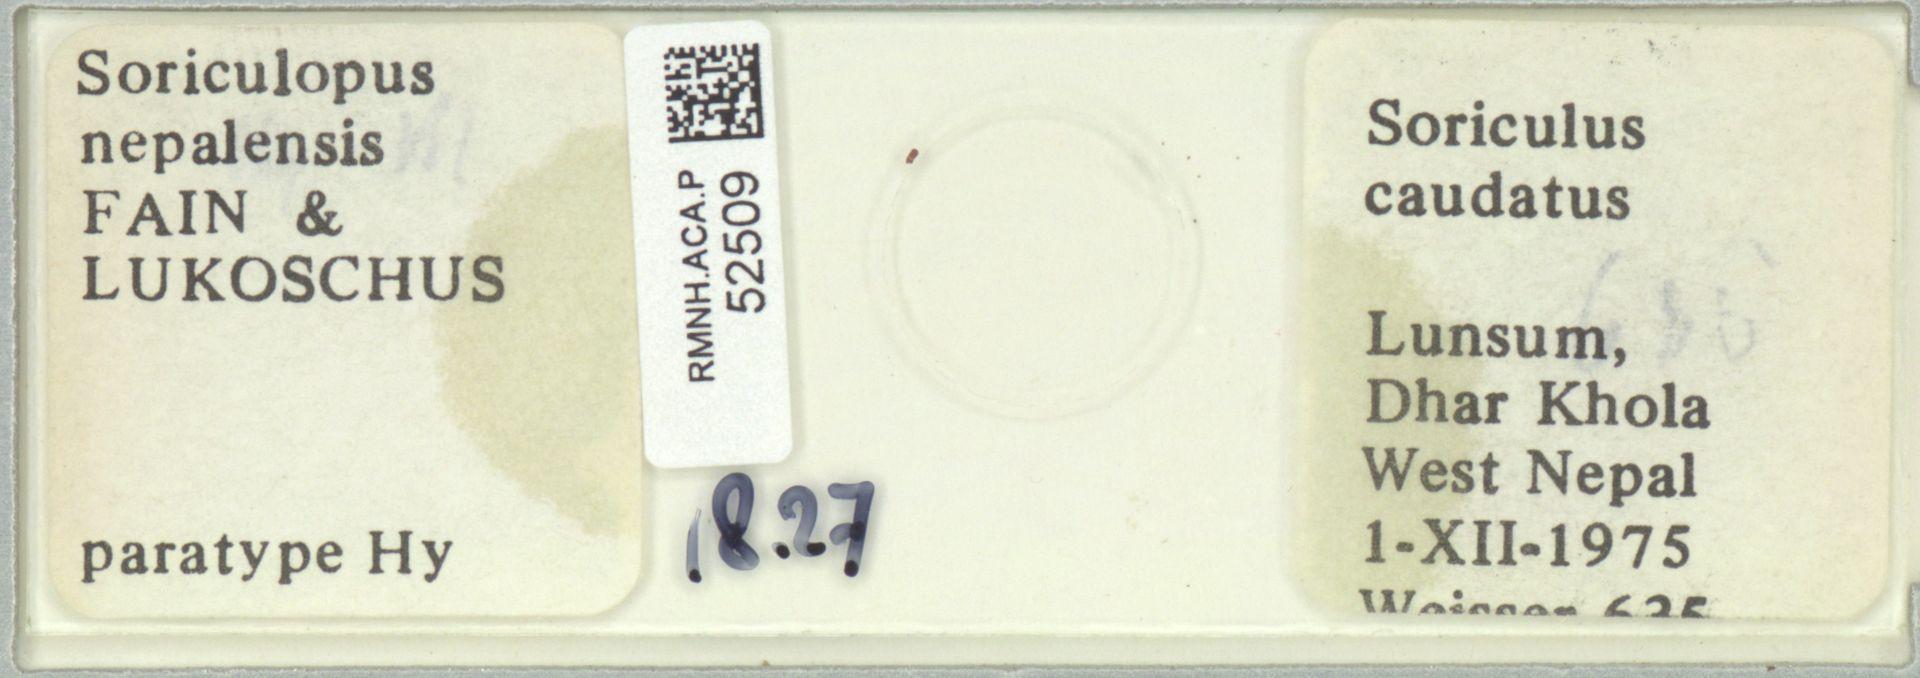 RMNH.ACA.P.52509 | Soriculopus nepalensis FAIN & LUKOSCHUS